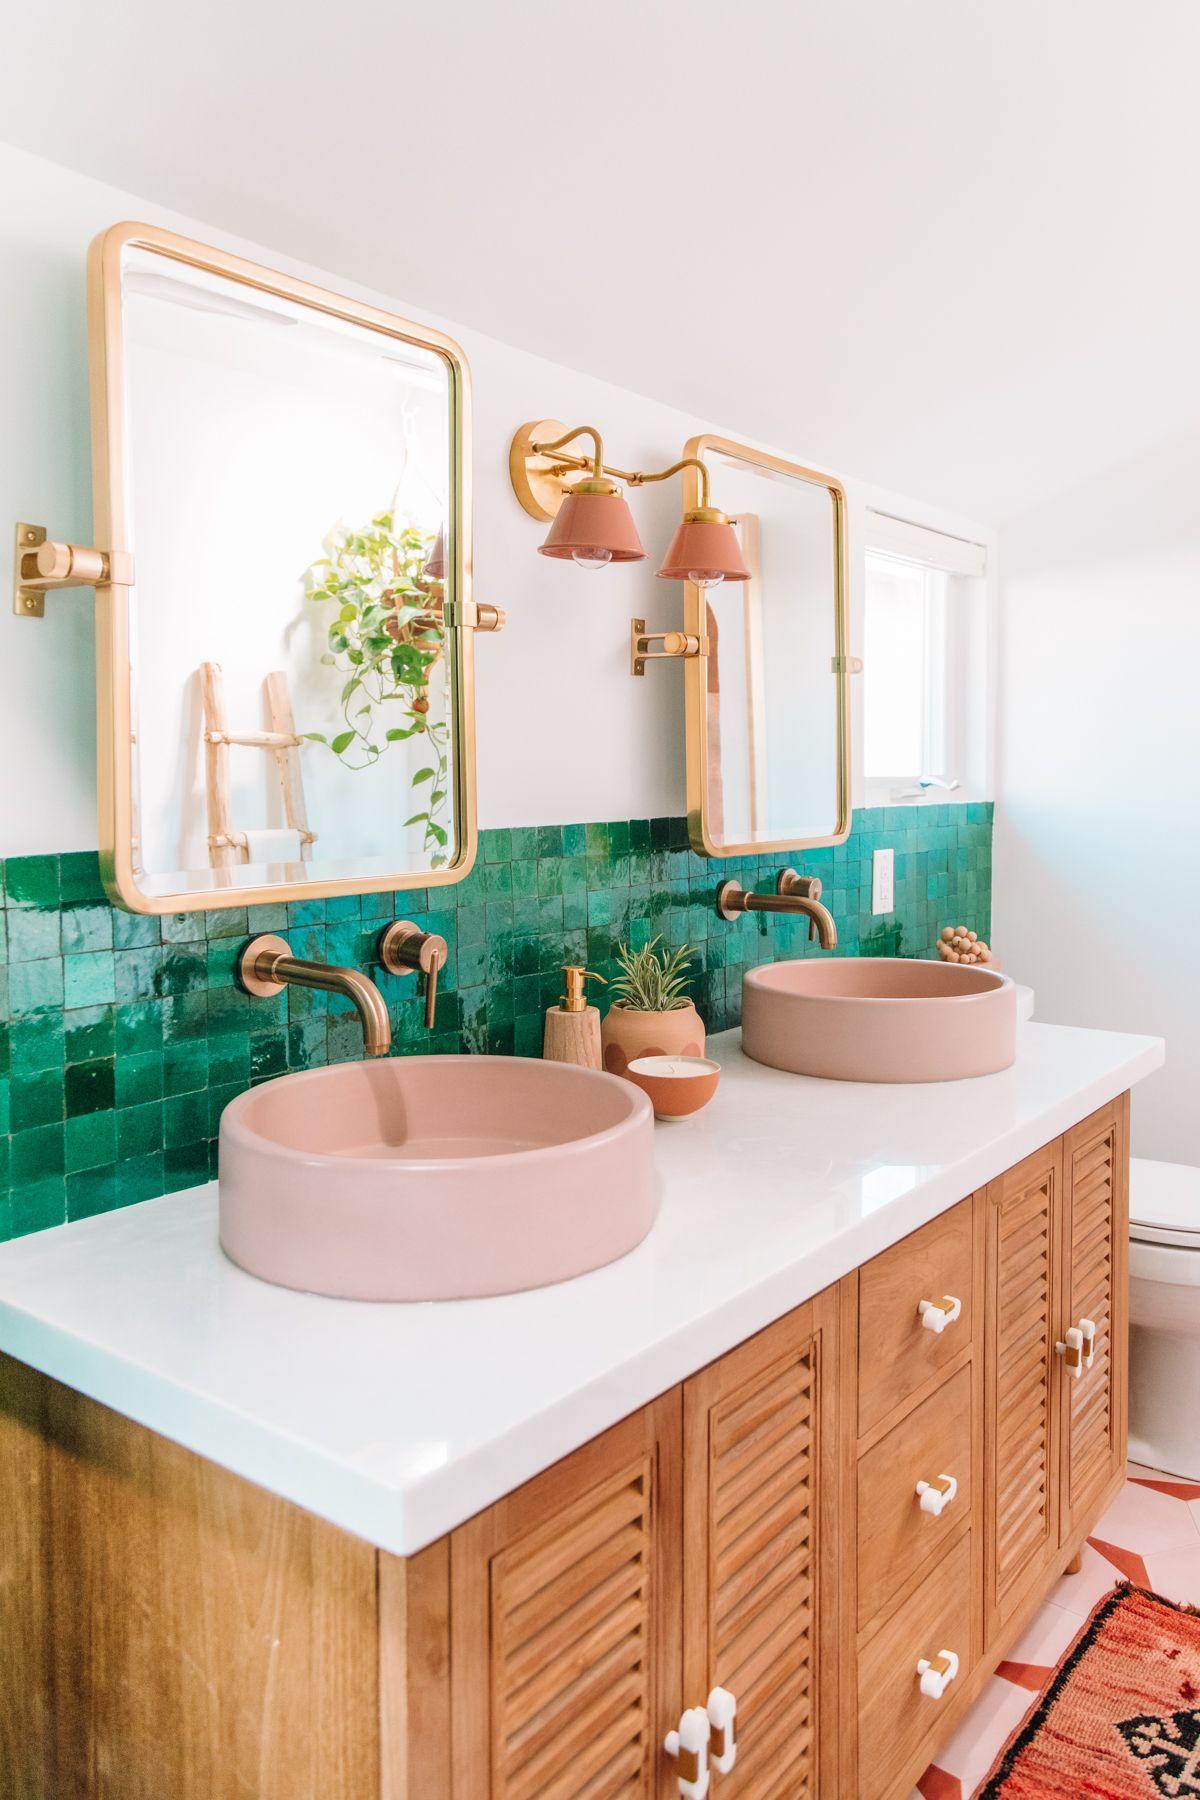 Studio Diy Master Bathroom Pink And Green Bathroom Inspiration 20 Photos That Will Prove Decorati Green Tile Bathroom Master Bathroom Makeover Bright Homes